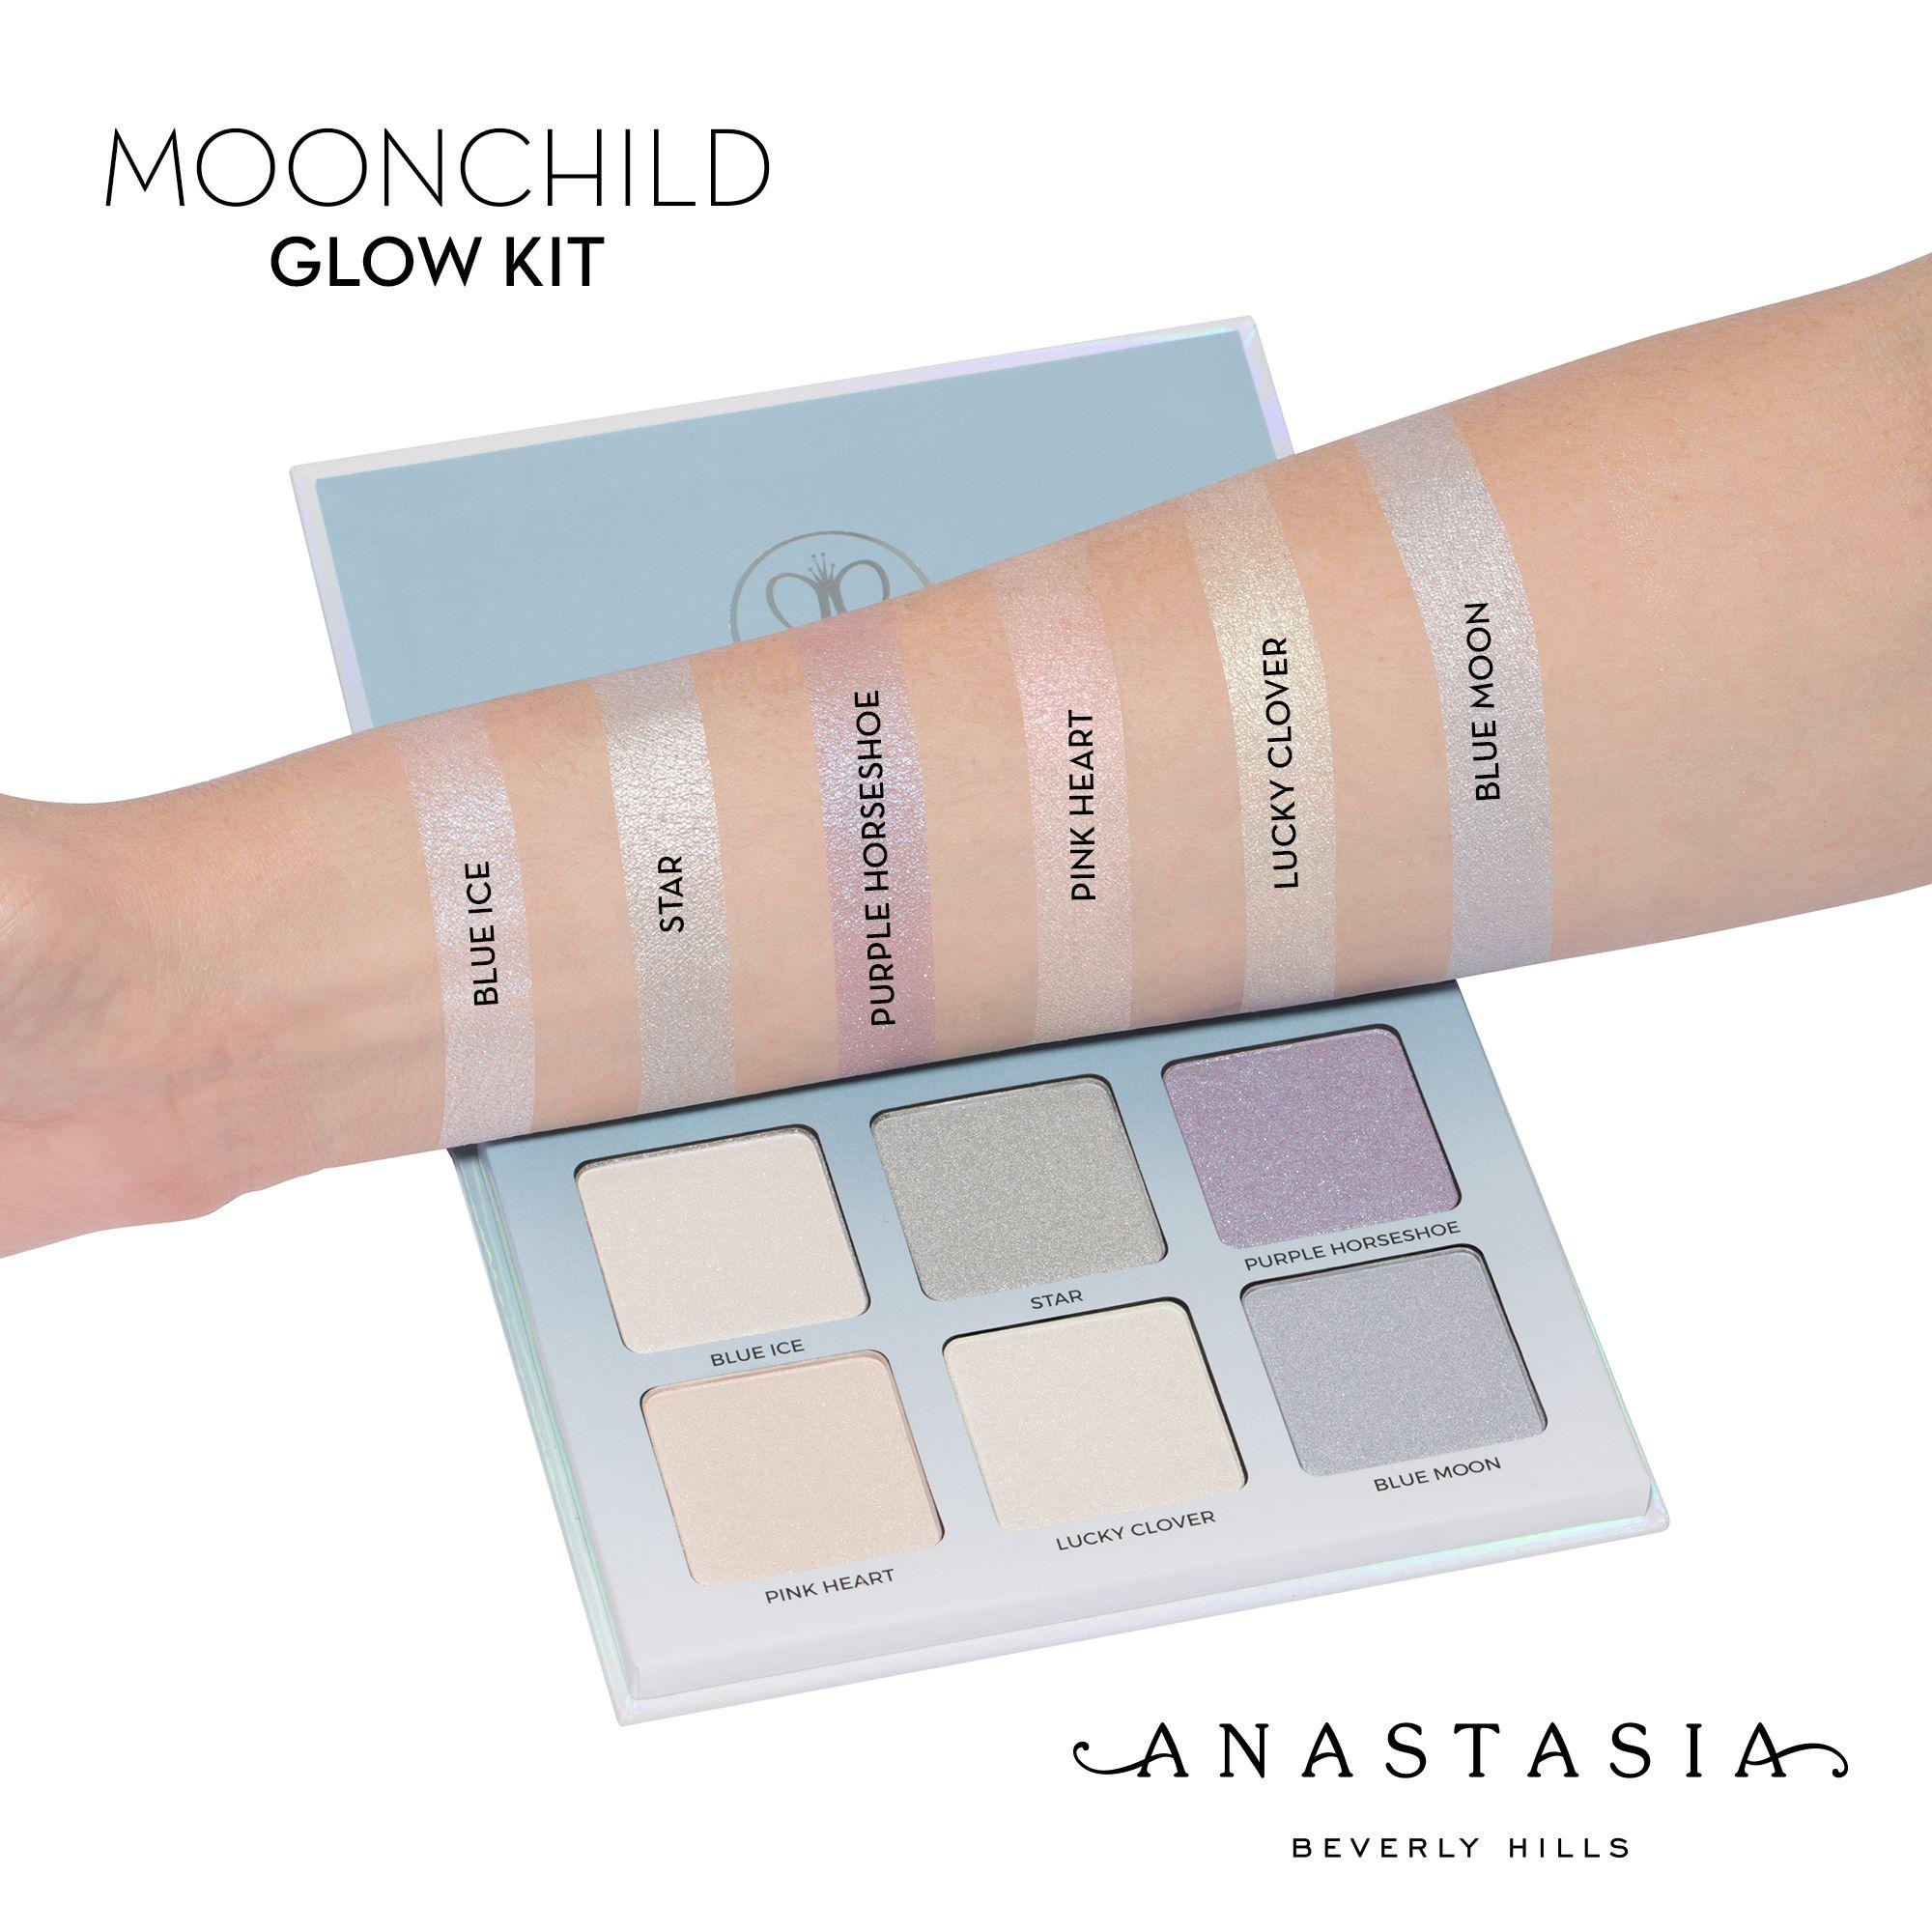 Glow Kit - Moonchild by Anastasia Beverly Hills #20